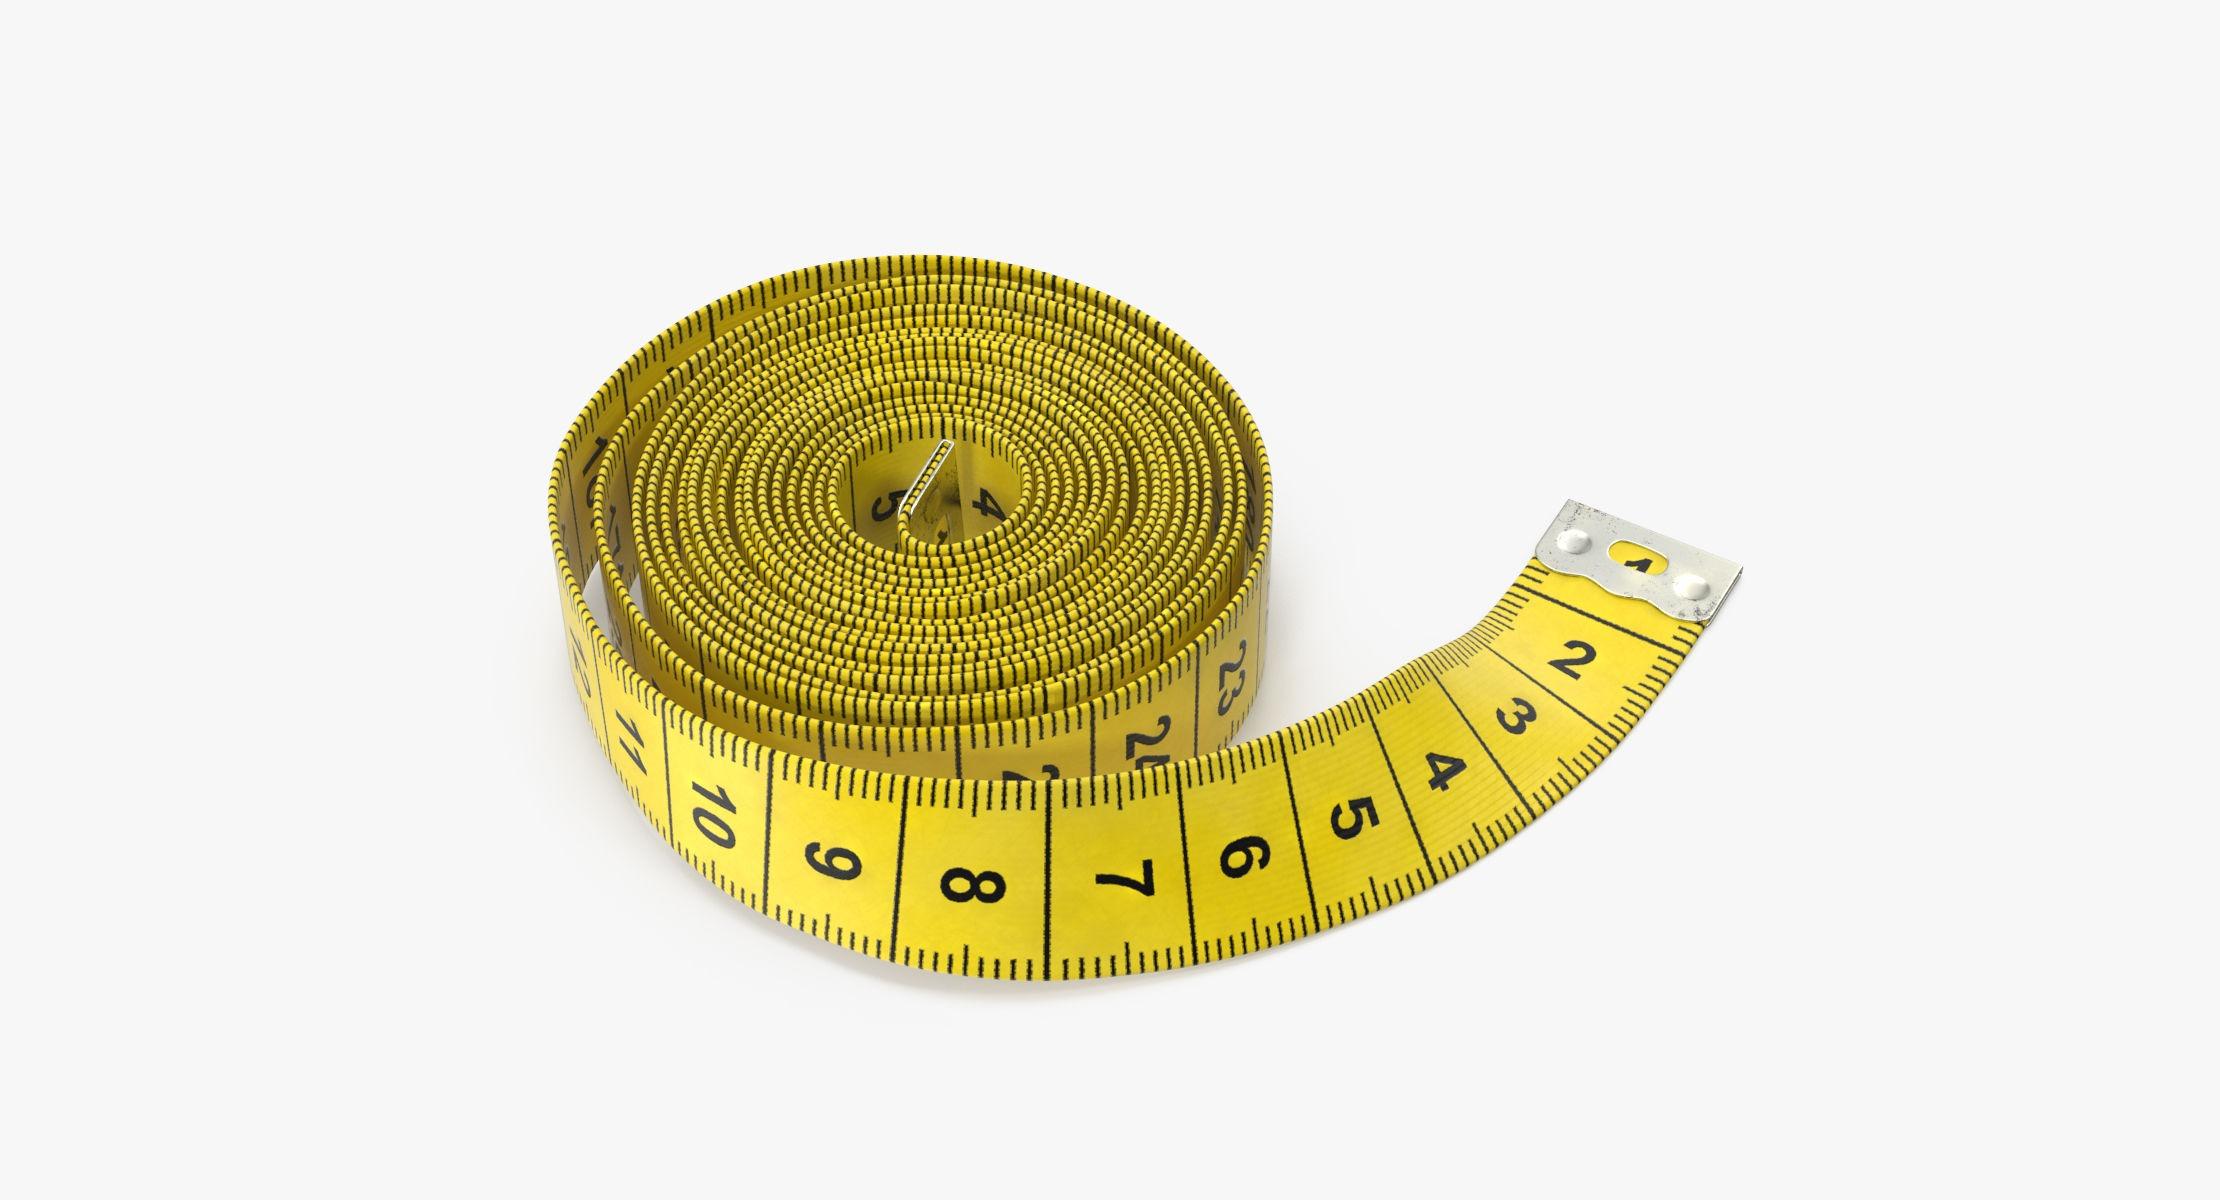 Tape Measurer 01 - reel 1